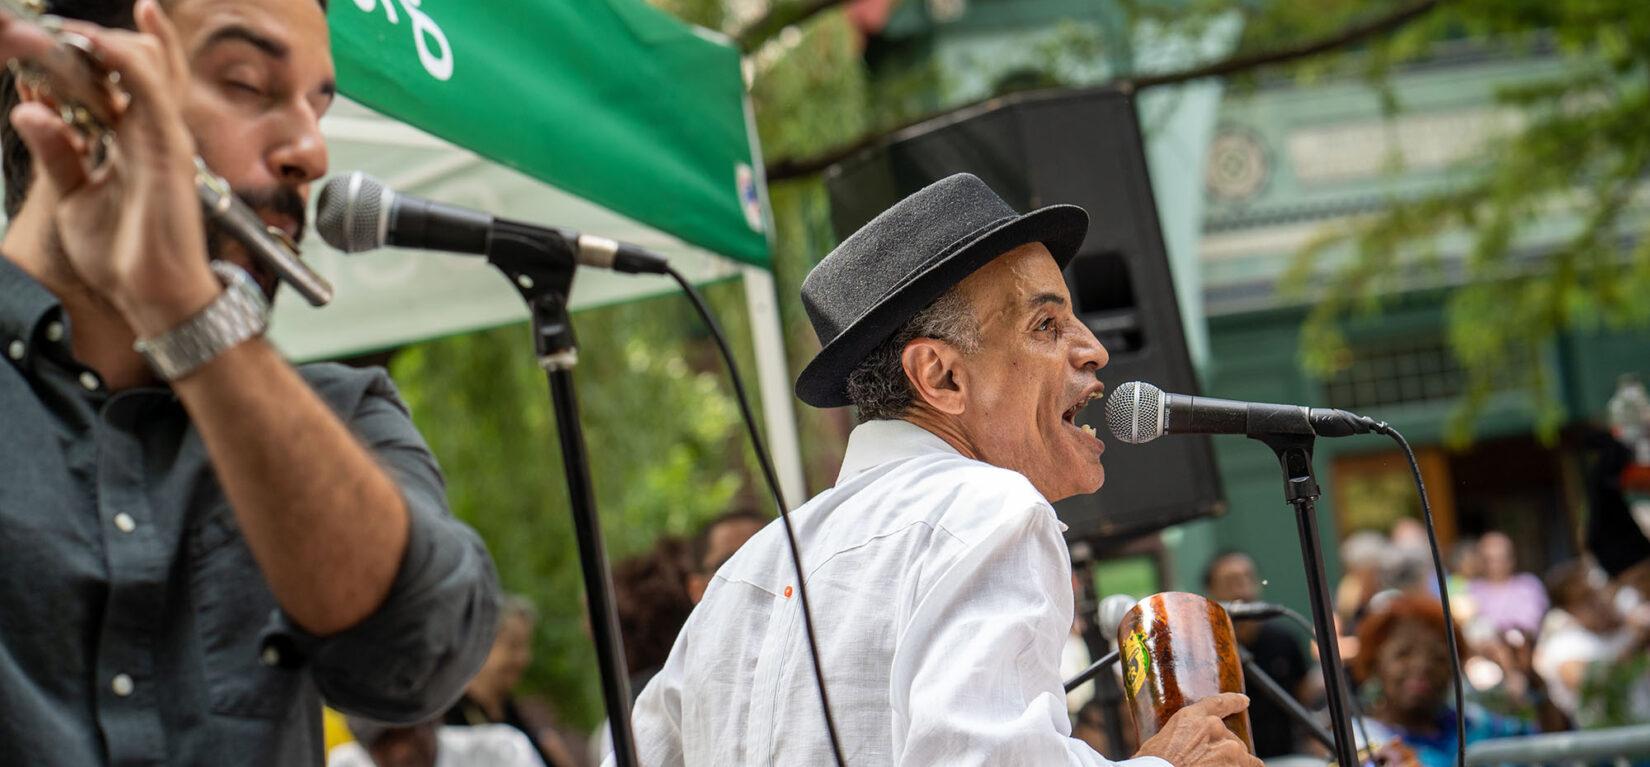 Harlem Meer Performance Festival Nears 30 Years